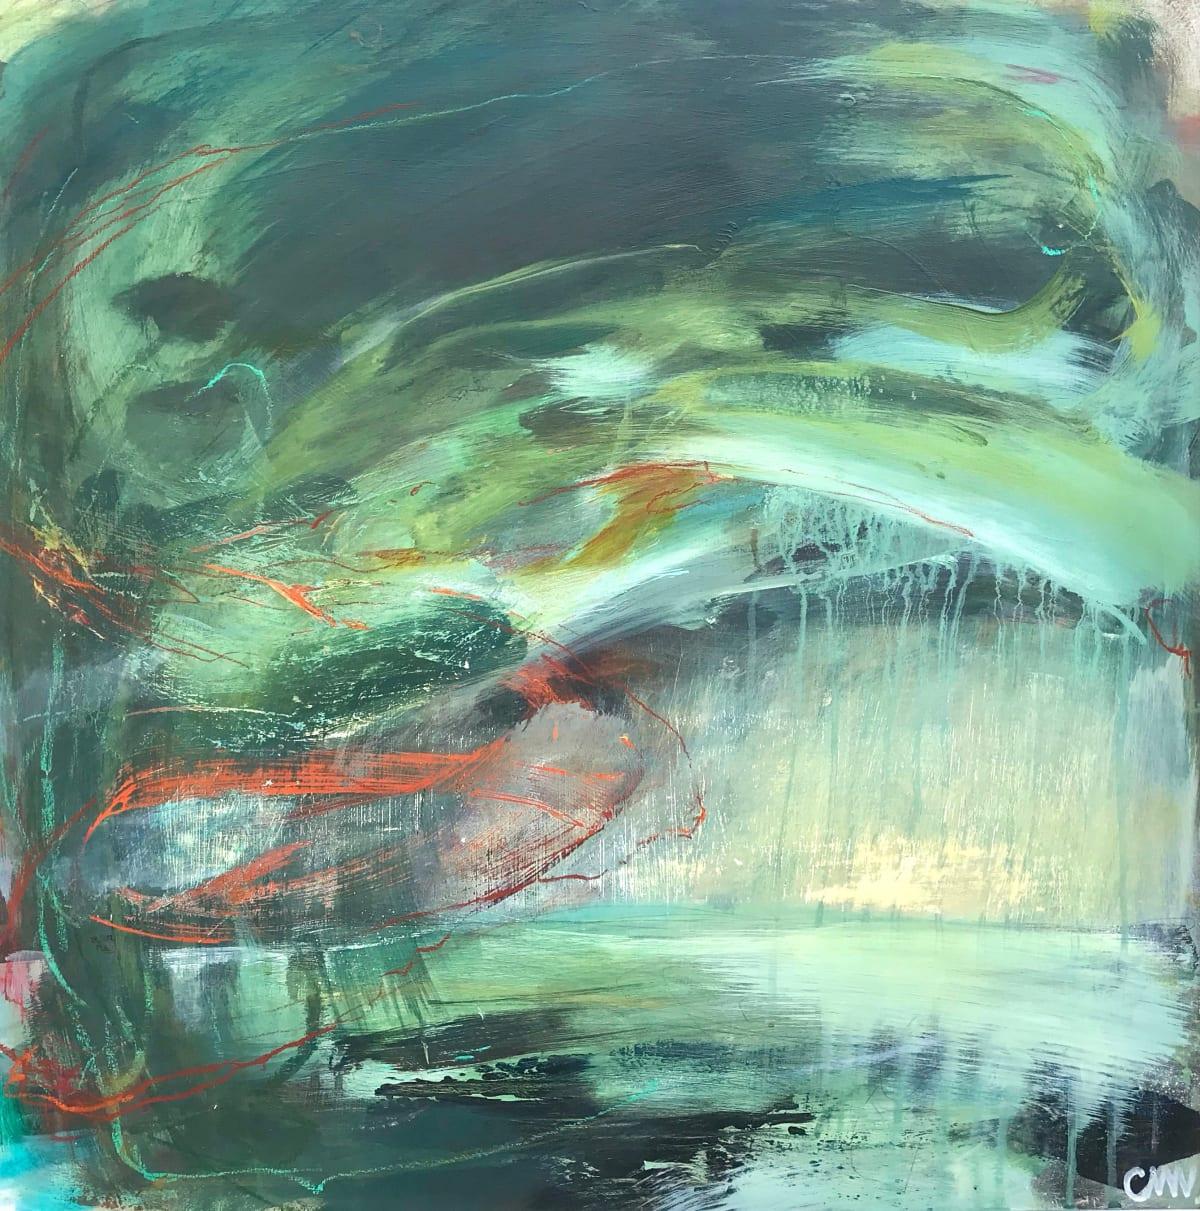 Clare Maria Wood Winter Seas II, 2019 Mixed Media Painting 60 x 60 x 5 cm 23 5/8 x 23 5/8 x 2 in